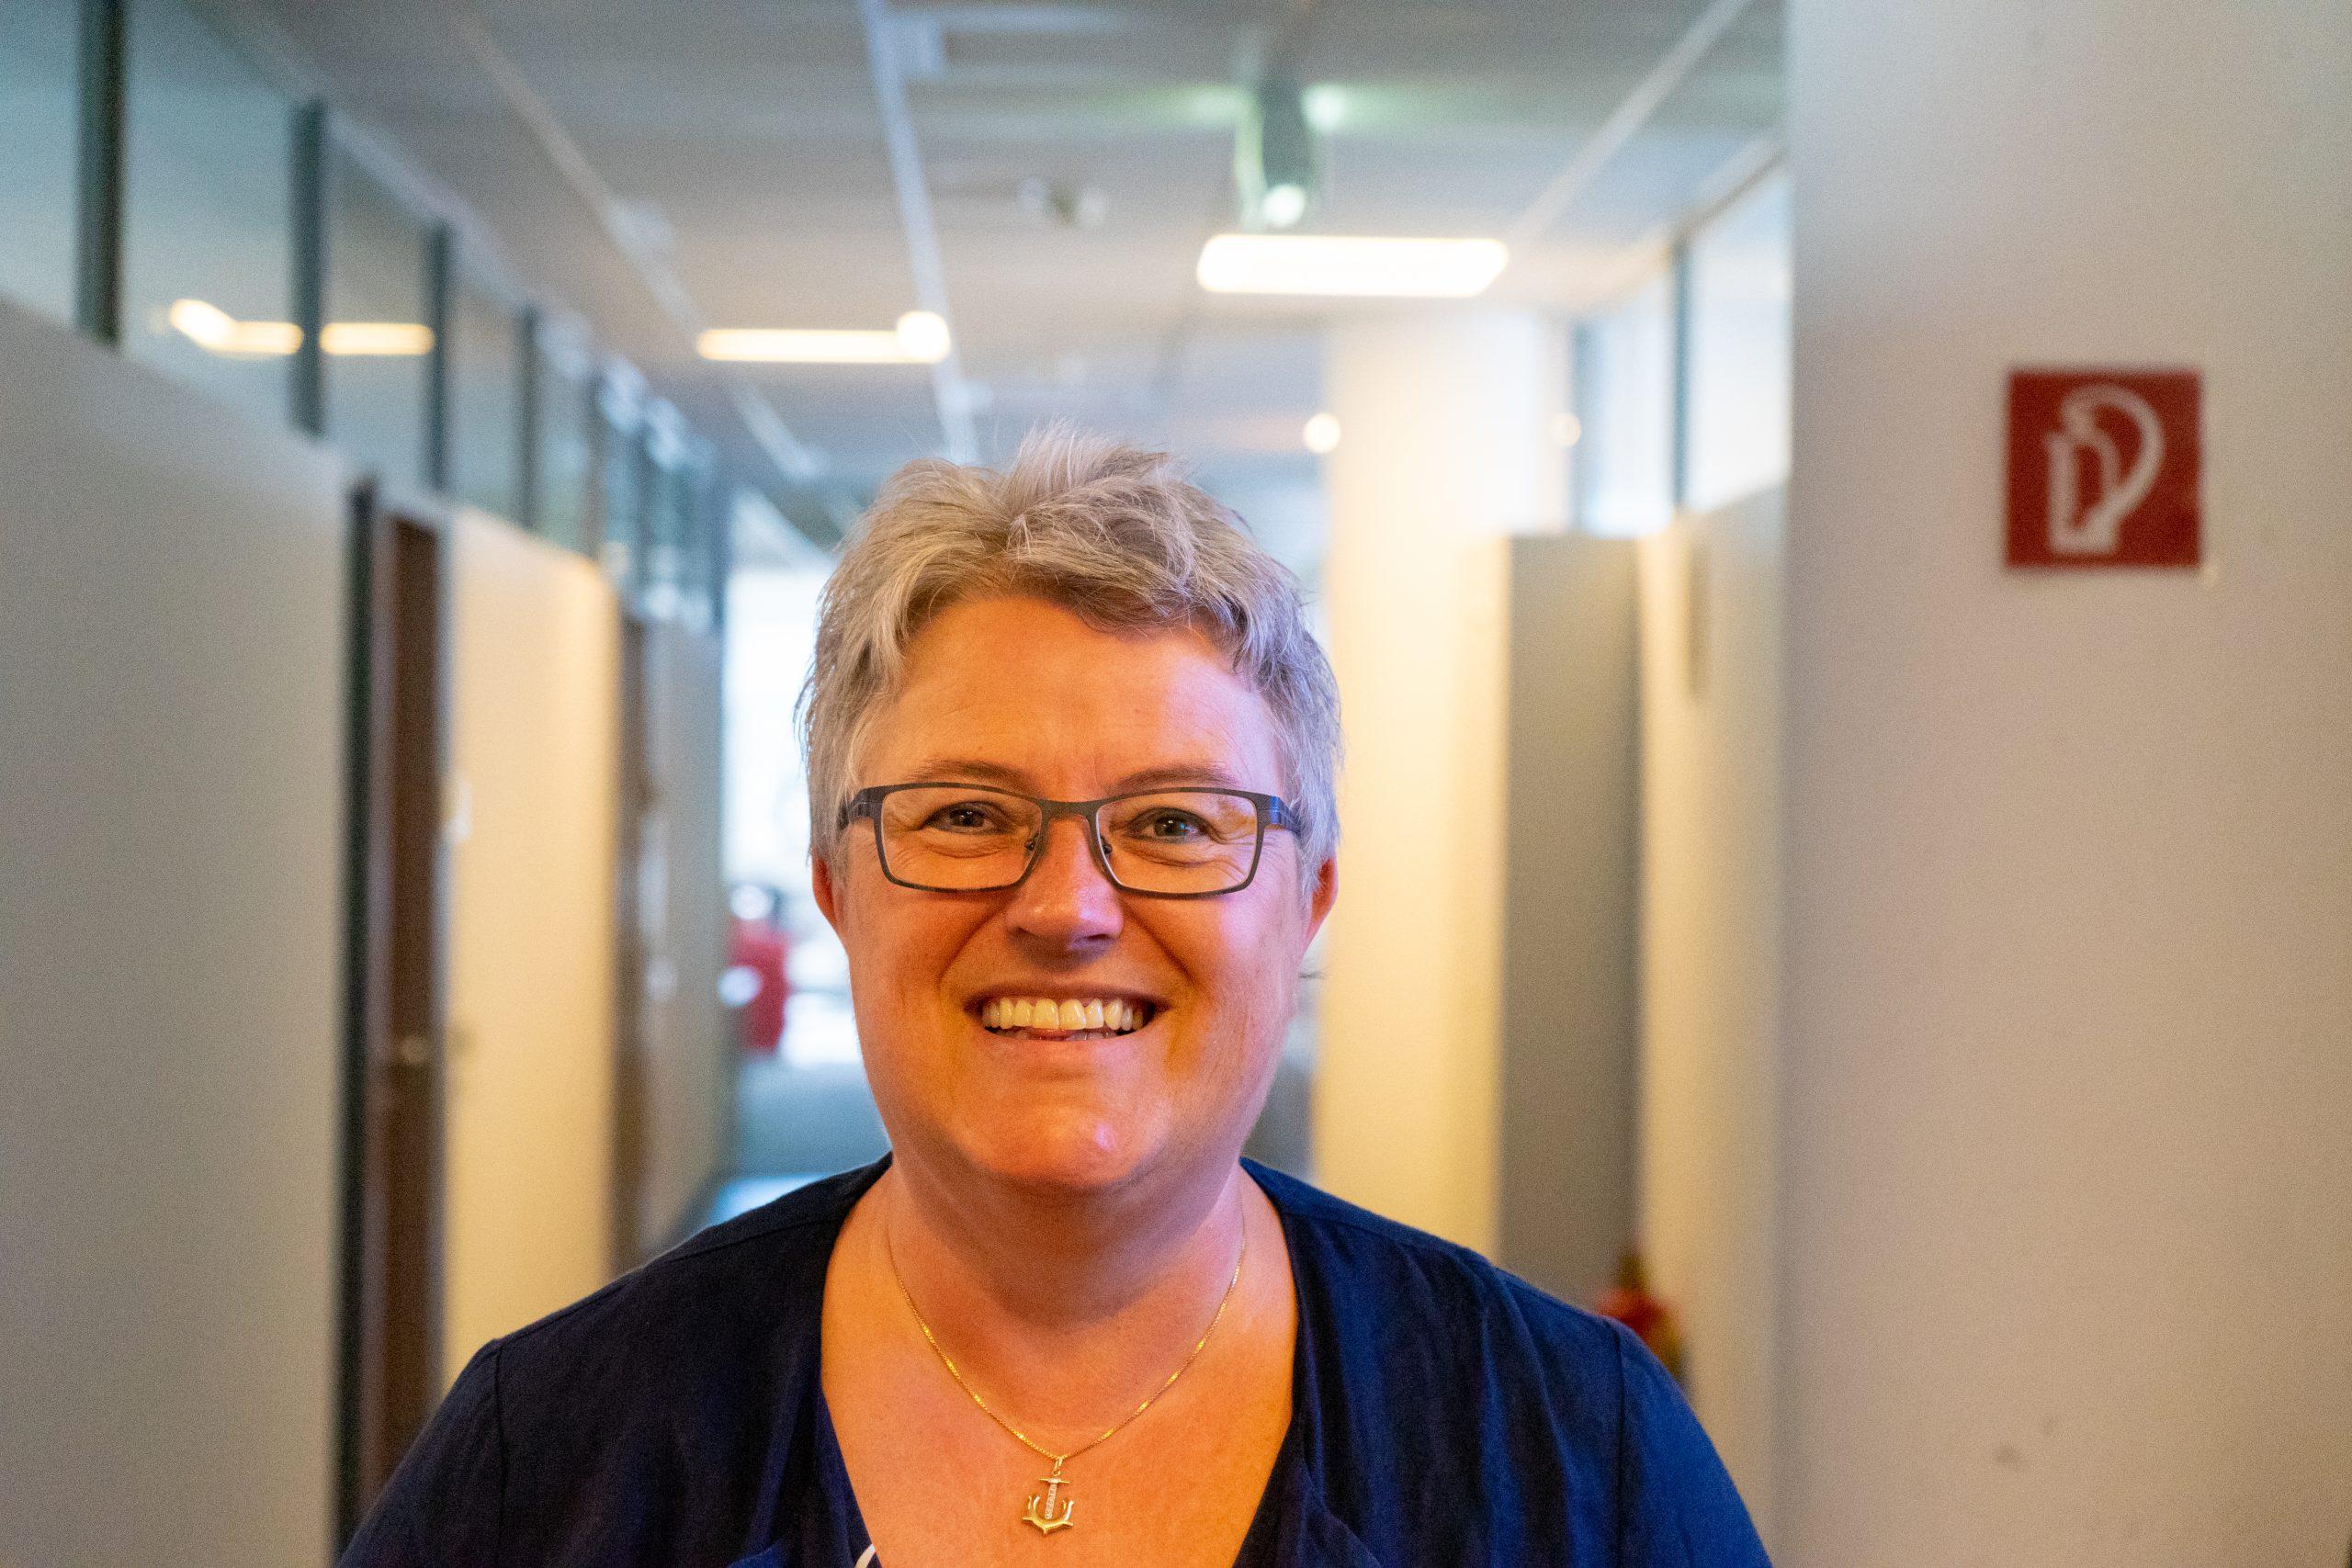 Claudia Wiedner